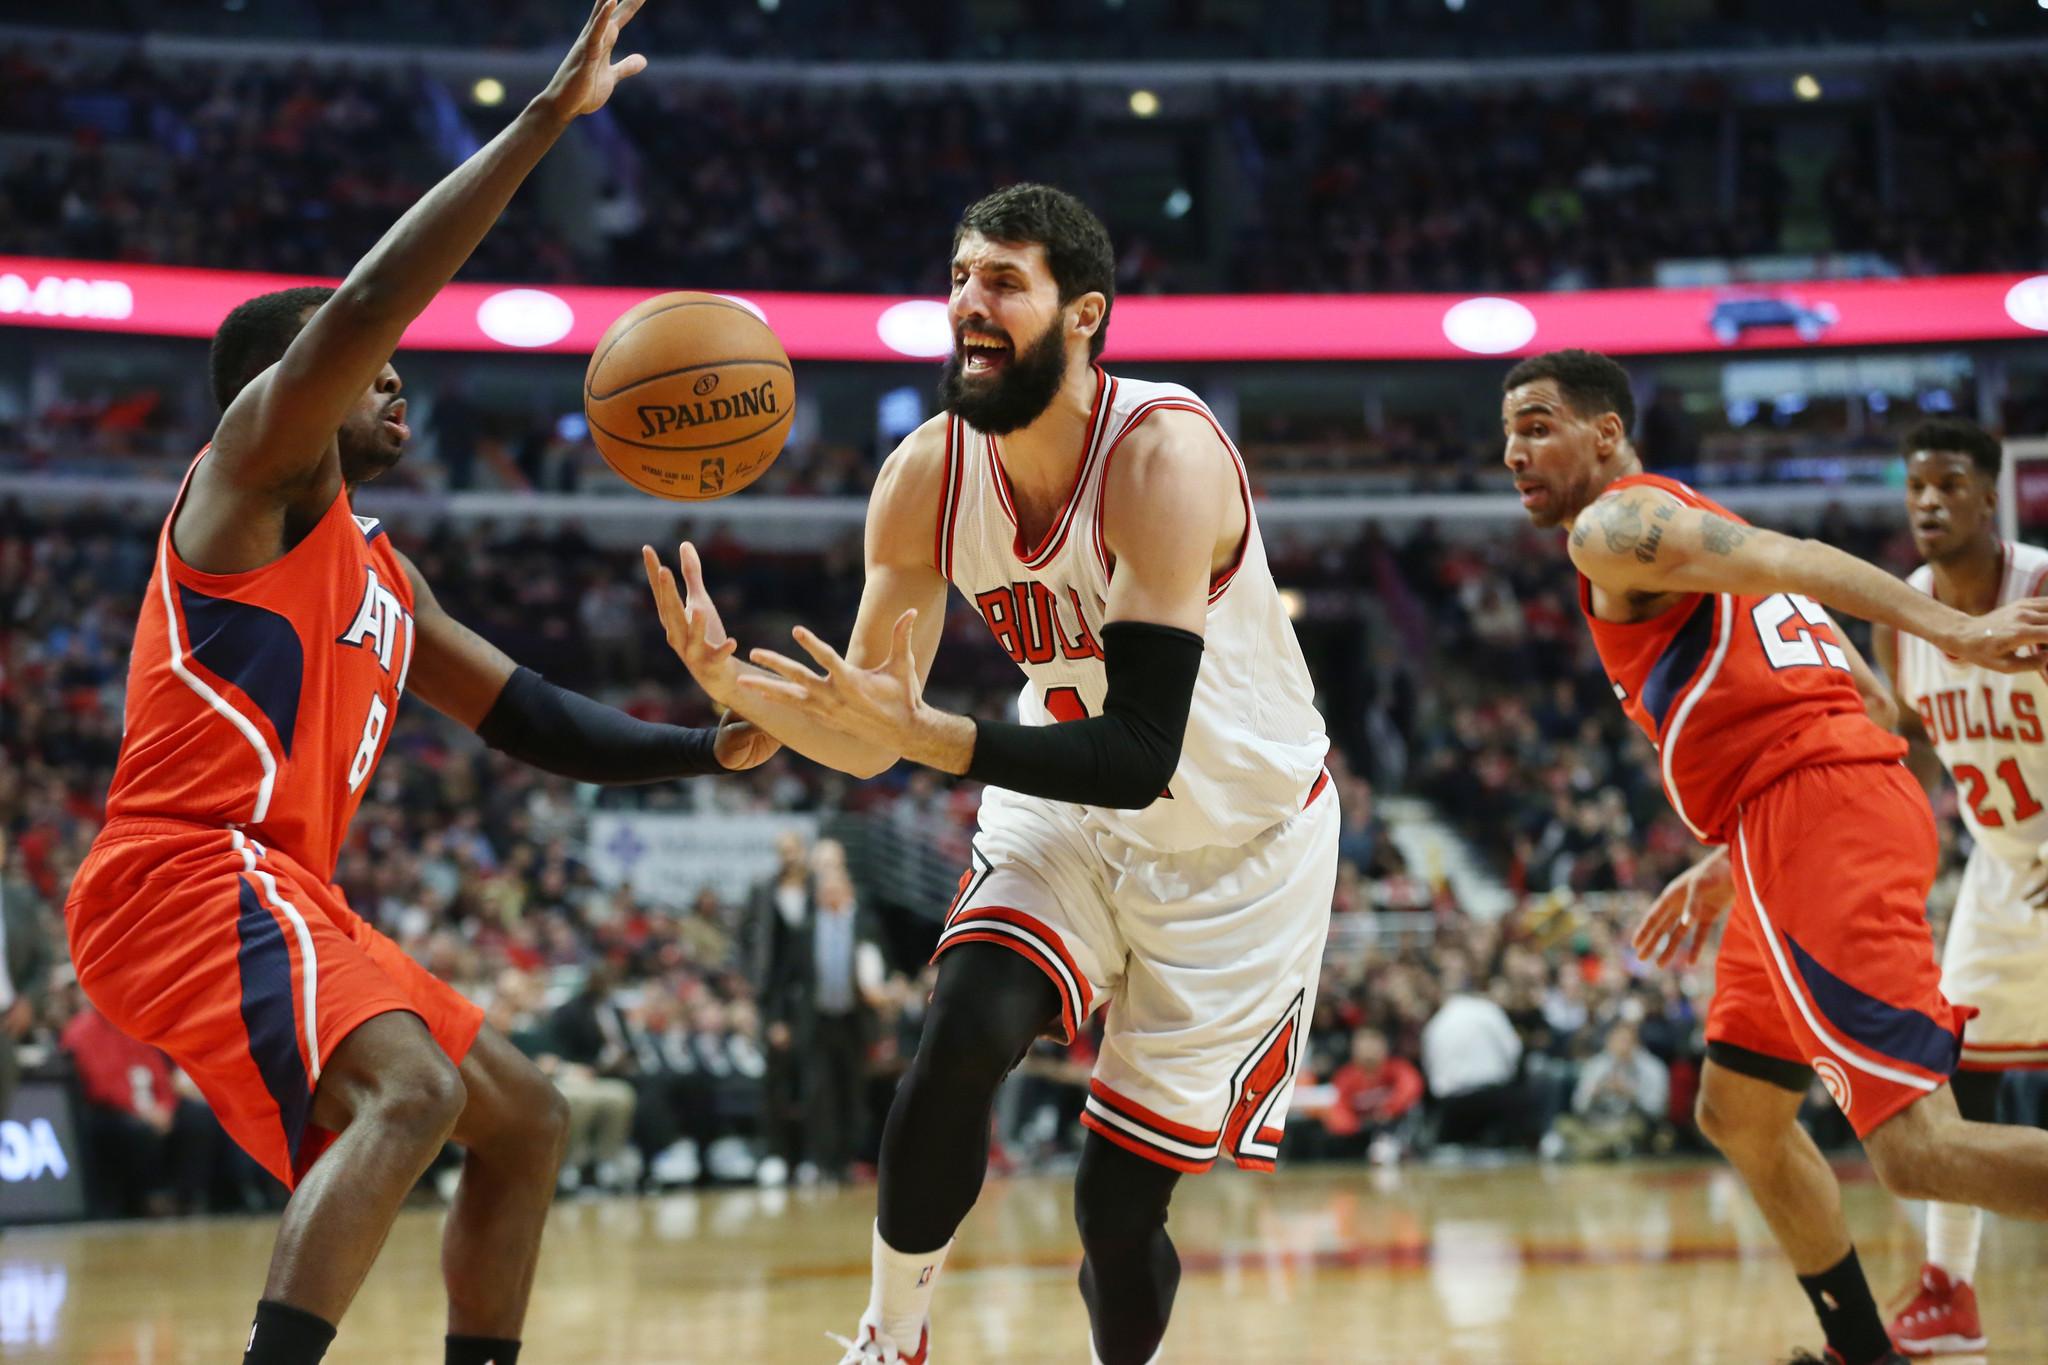 Hawks win 107-99, show Bulls how its done